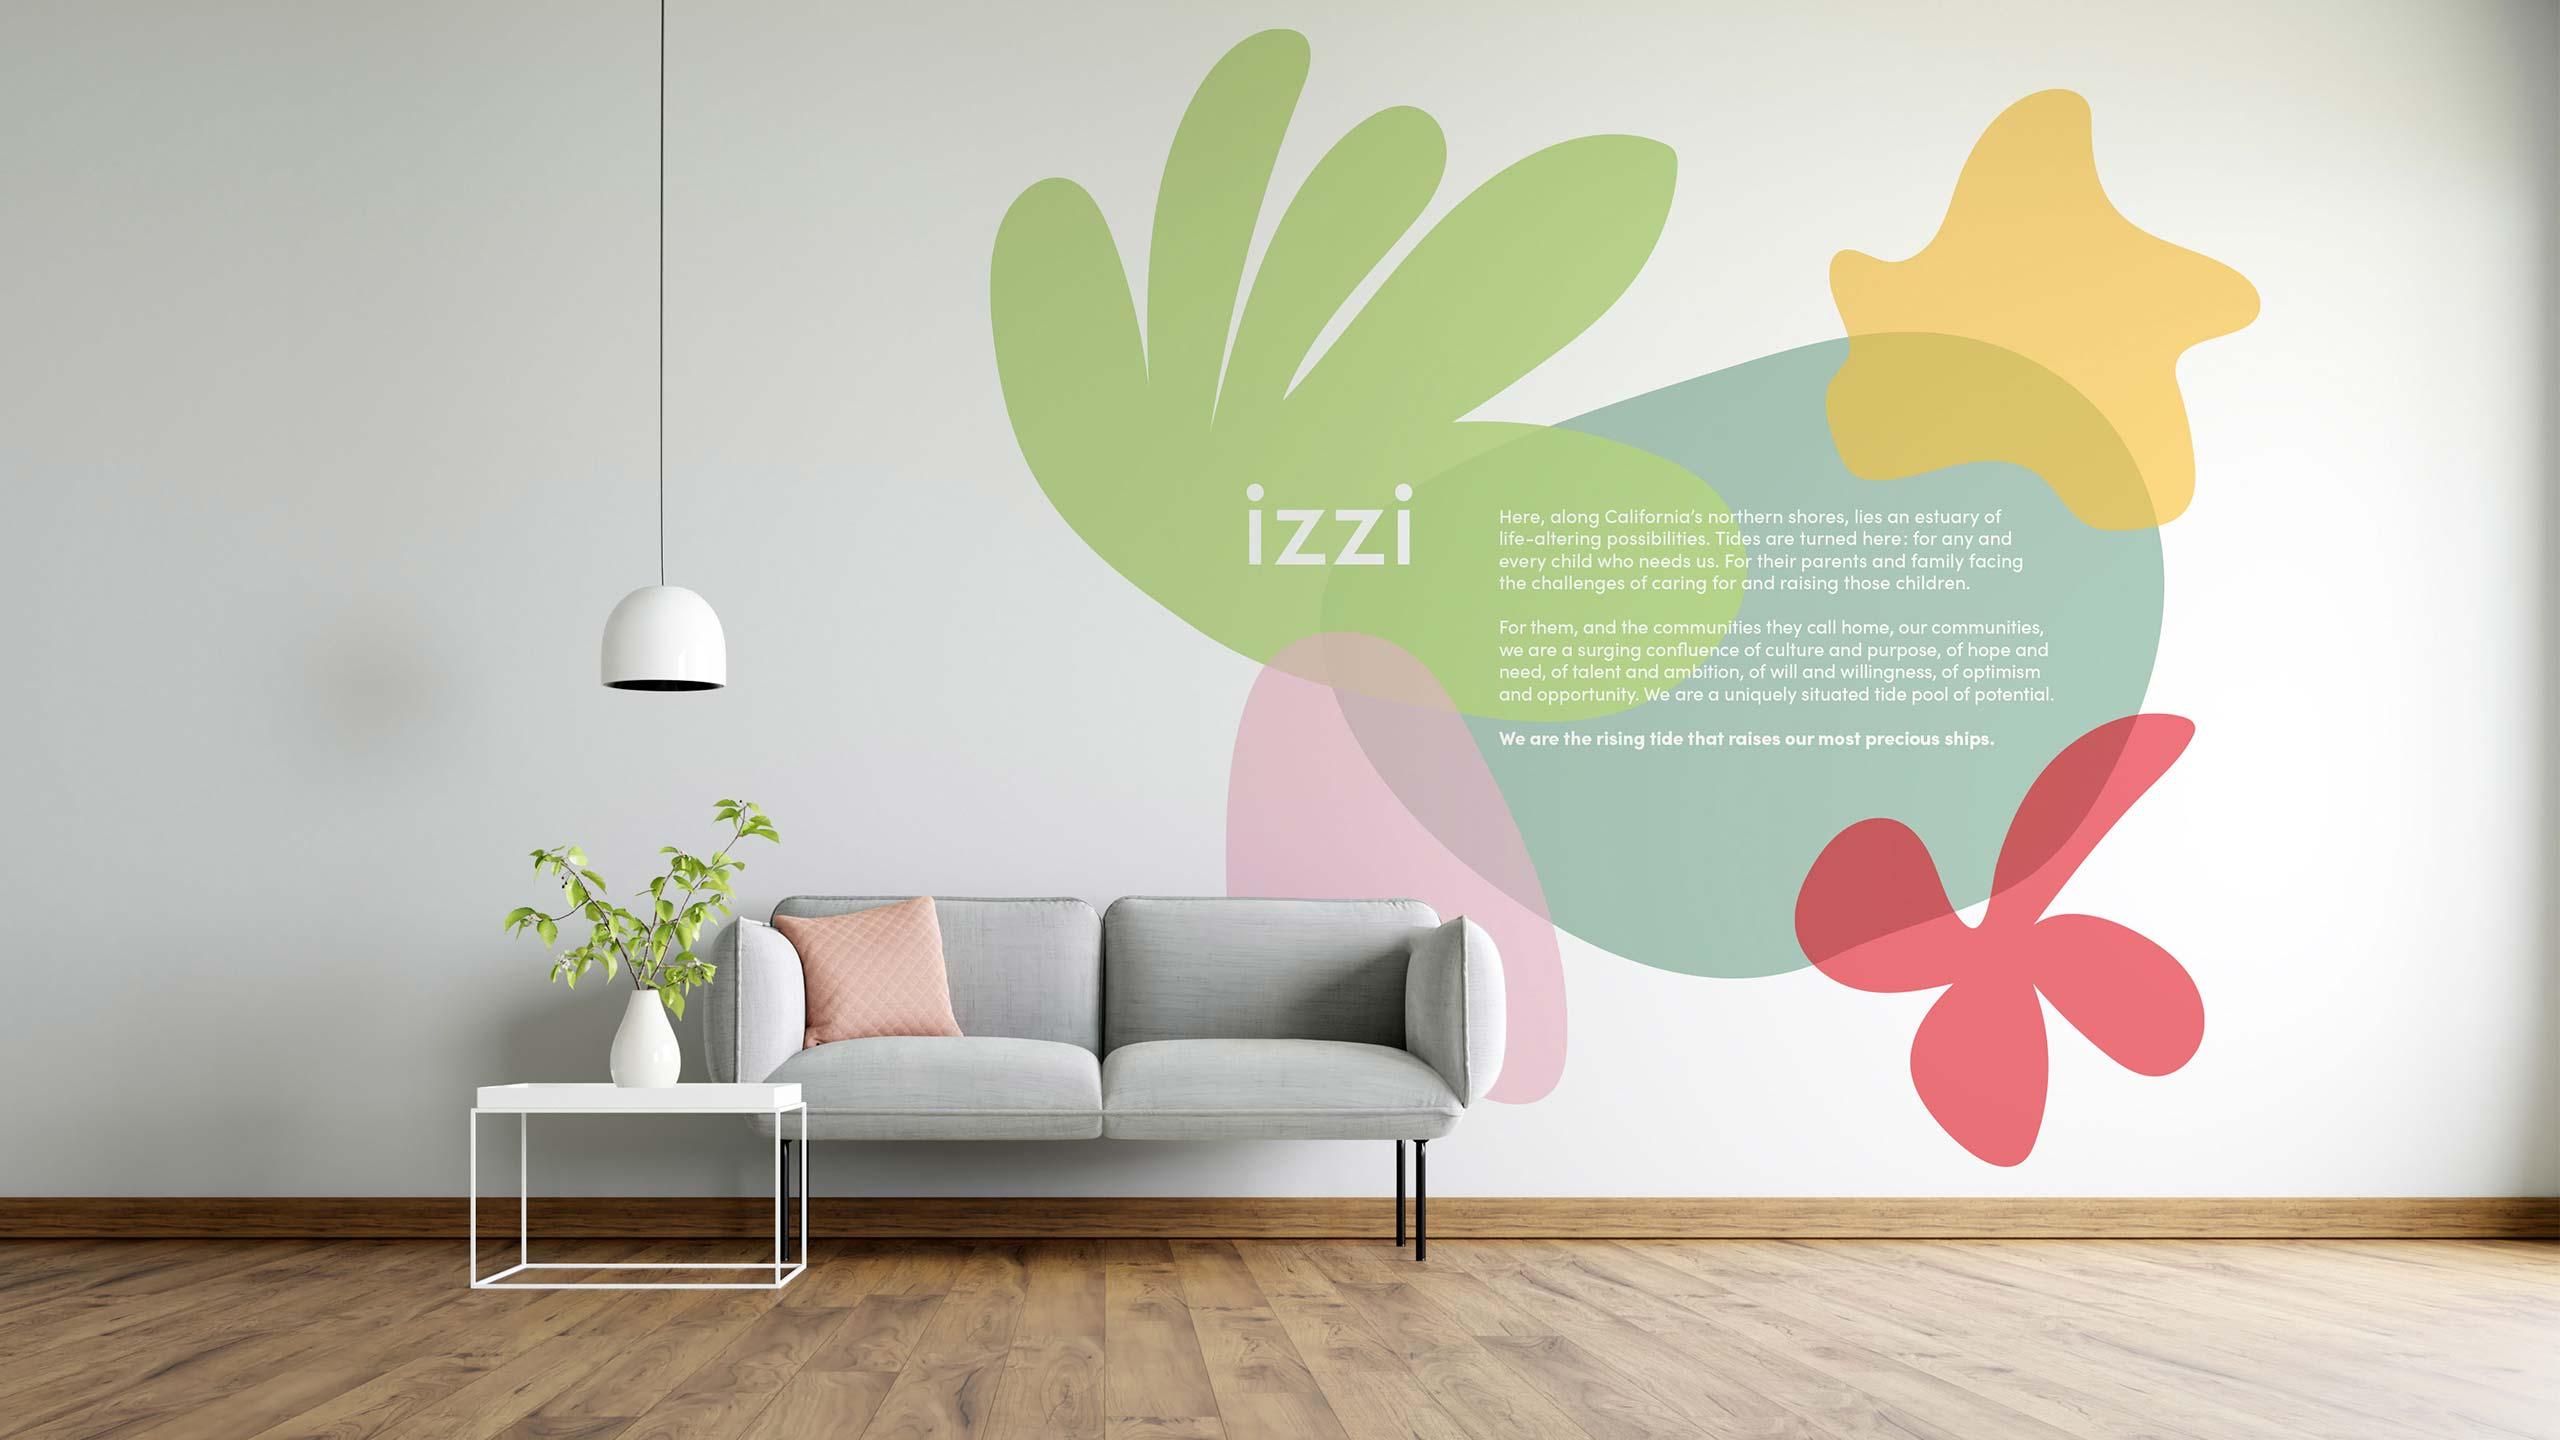 Izzi wall graphic